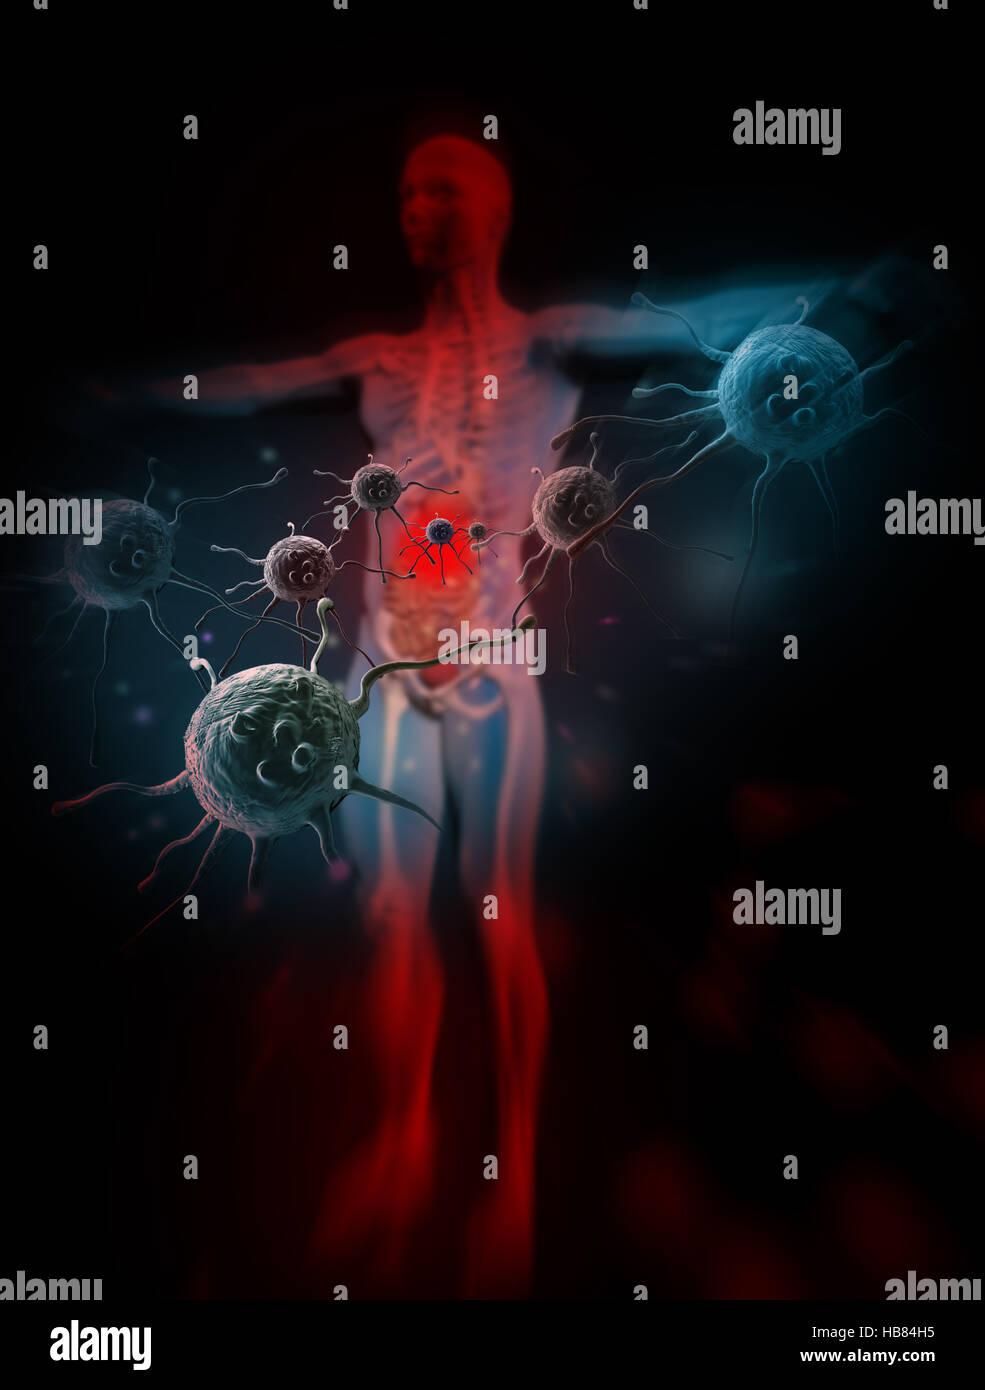 Immunity Against Diseases - Stock Image